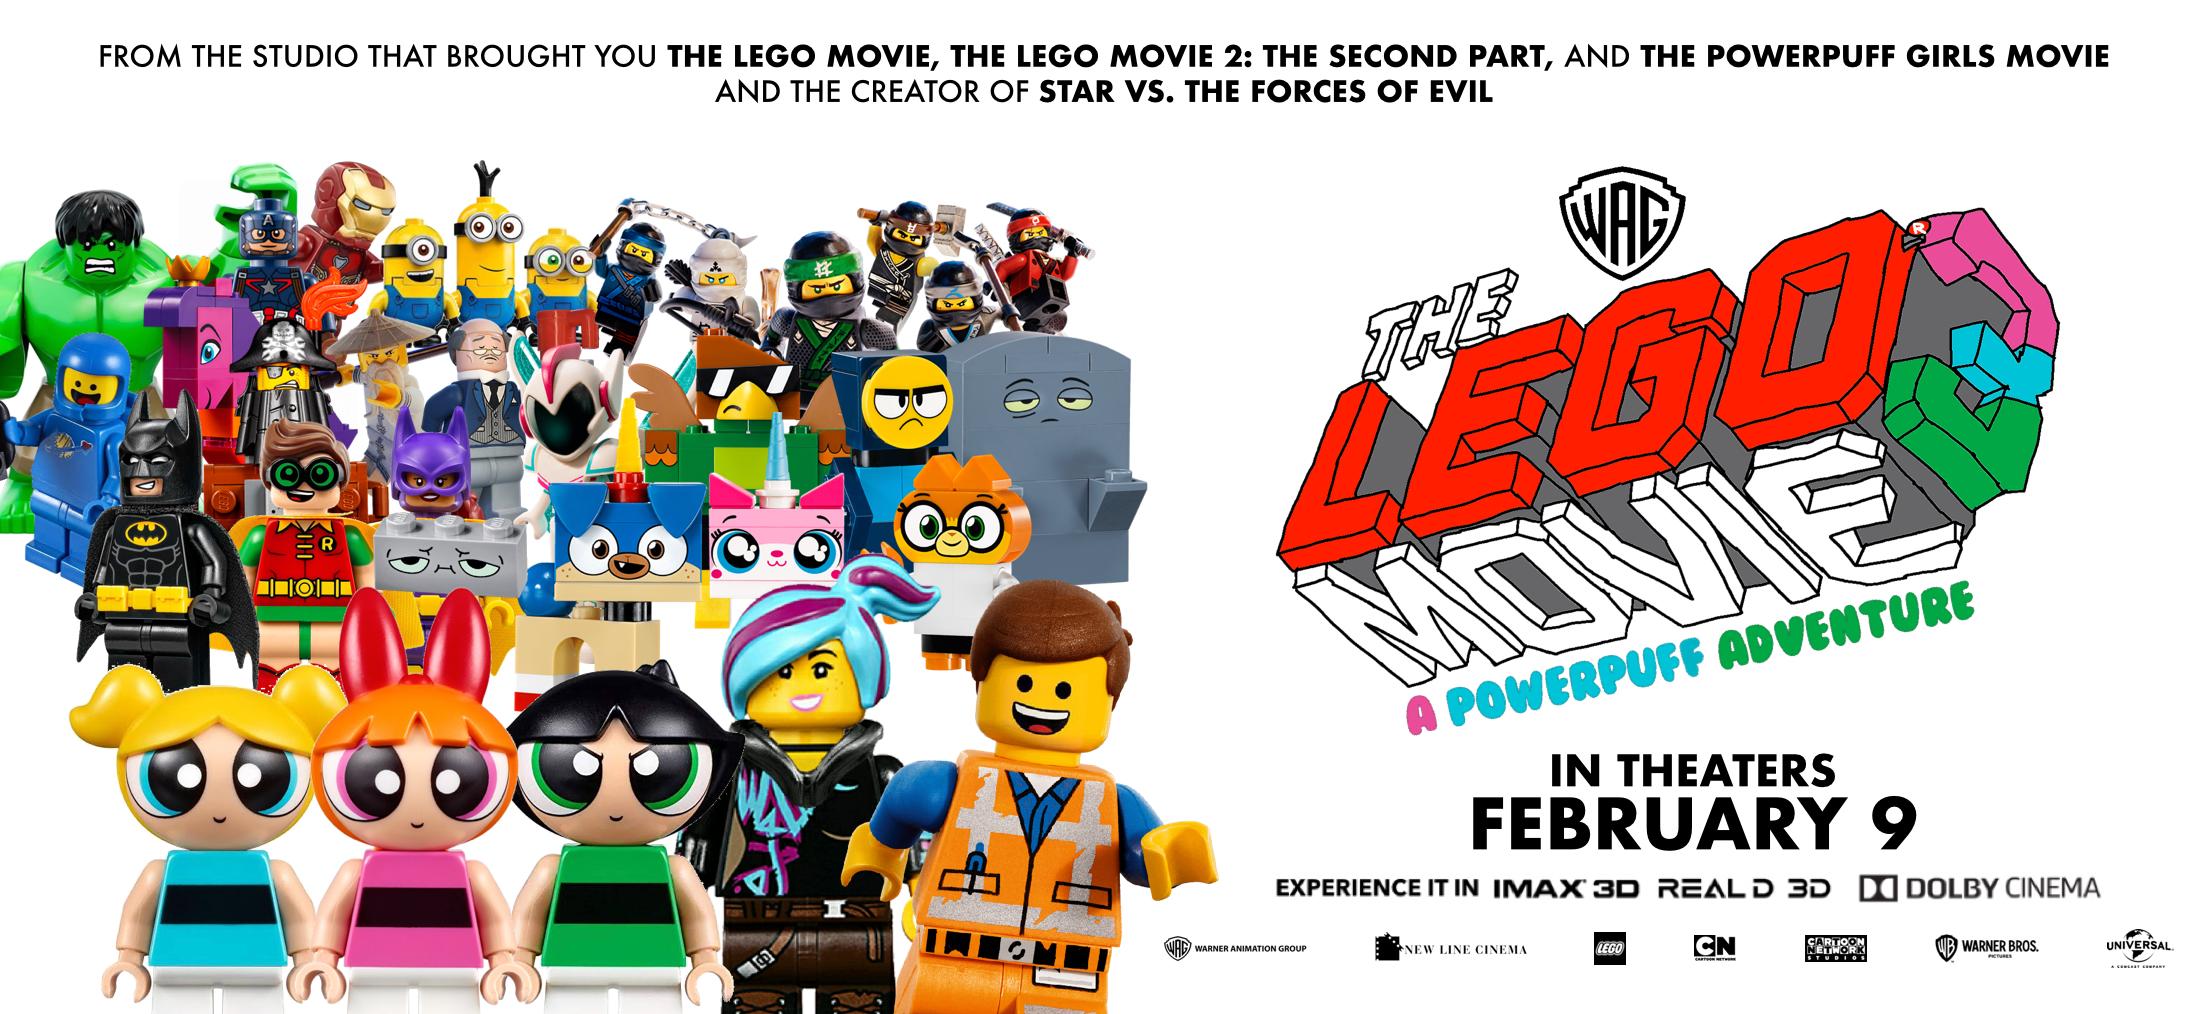 The LEGO Movie 3: A Powerpuff Adventure | Fandom